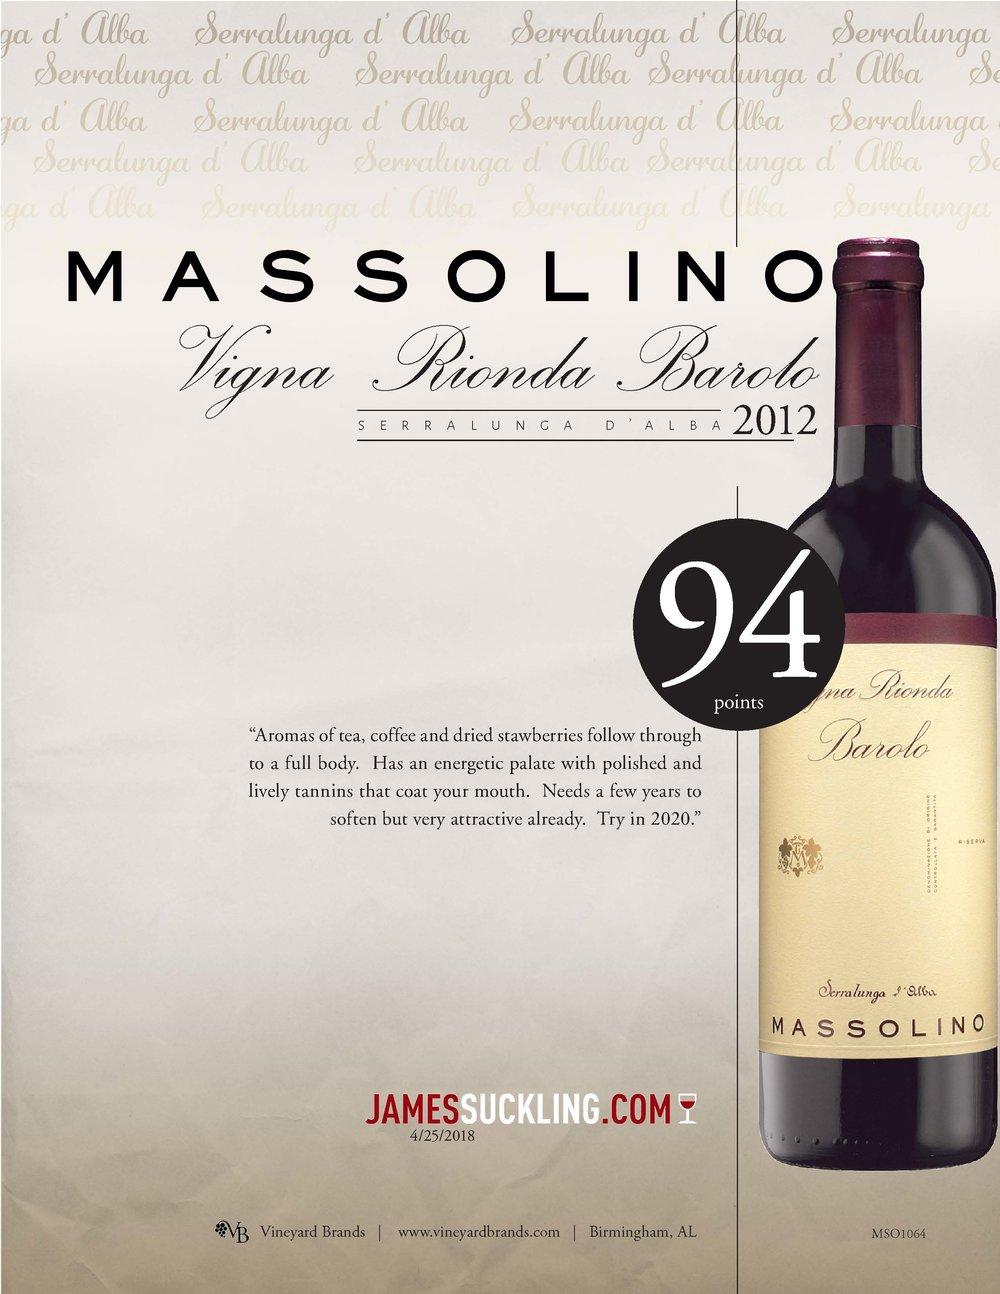 Massolino Vigna Rionda Barolo.jpg